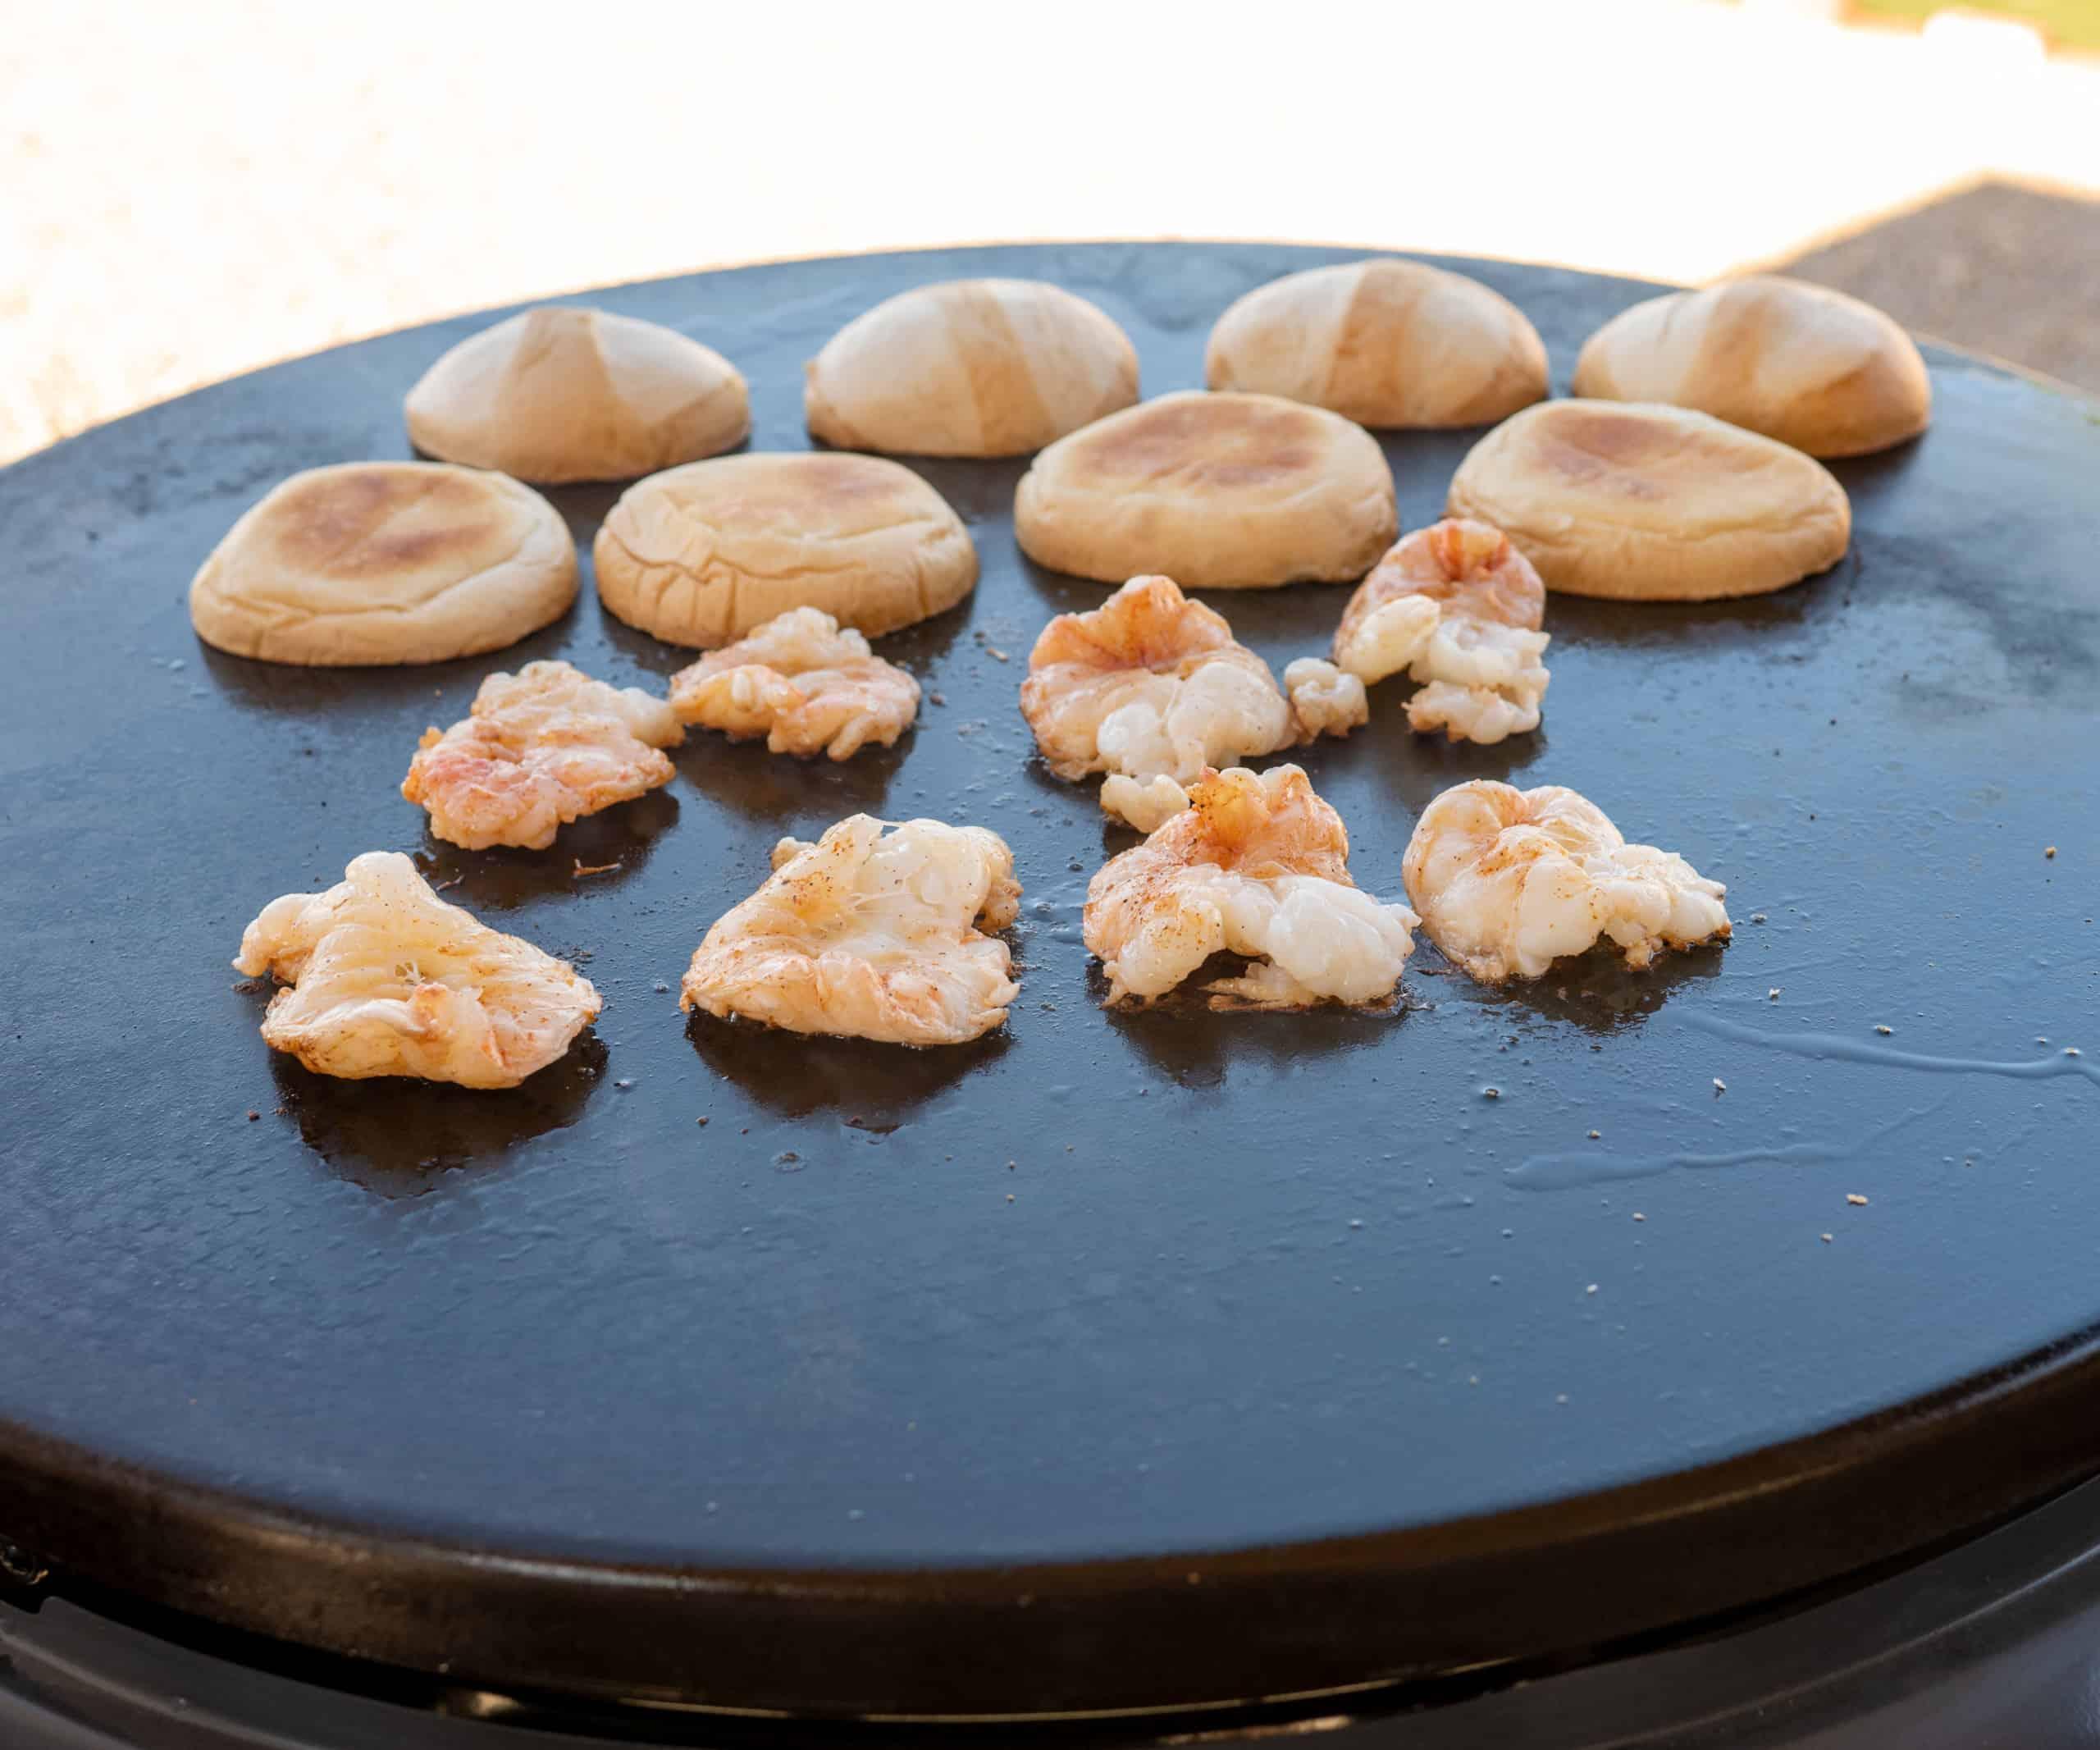 shrimp on griddle vein side down with buns